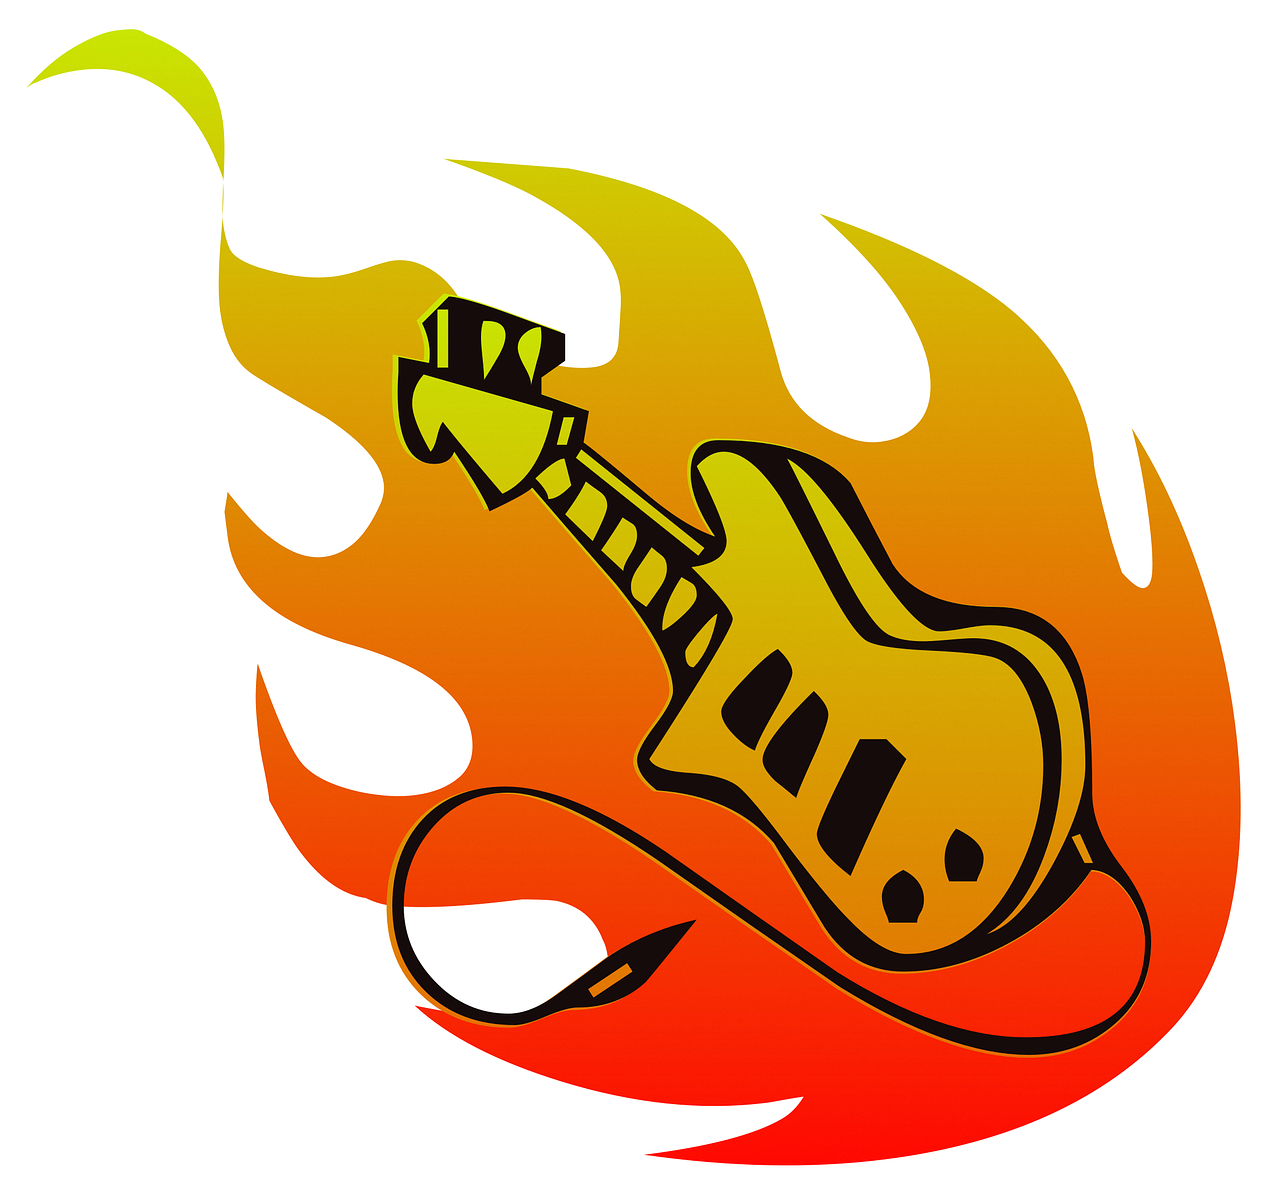 картинка рок картинки примеру, виде музыкального